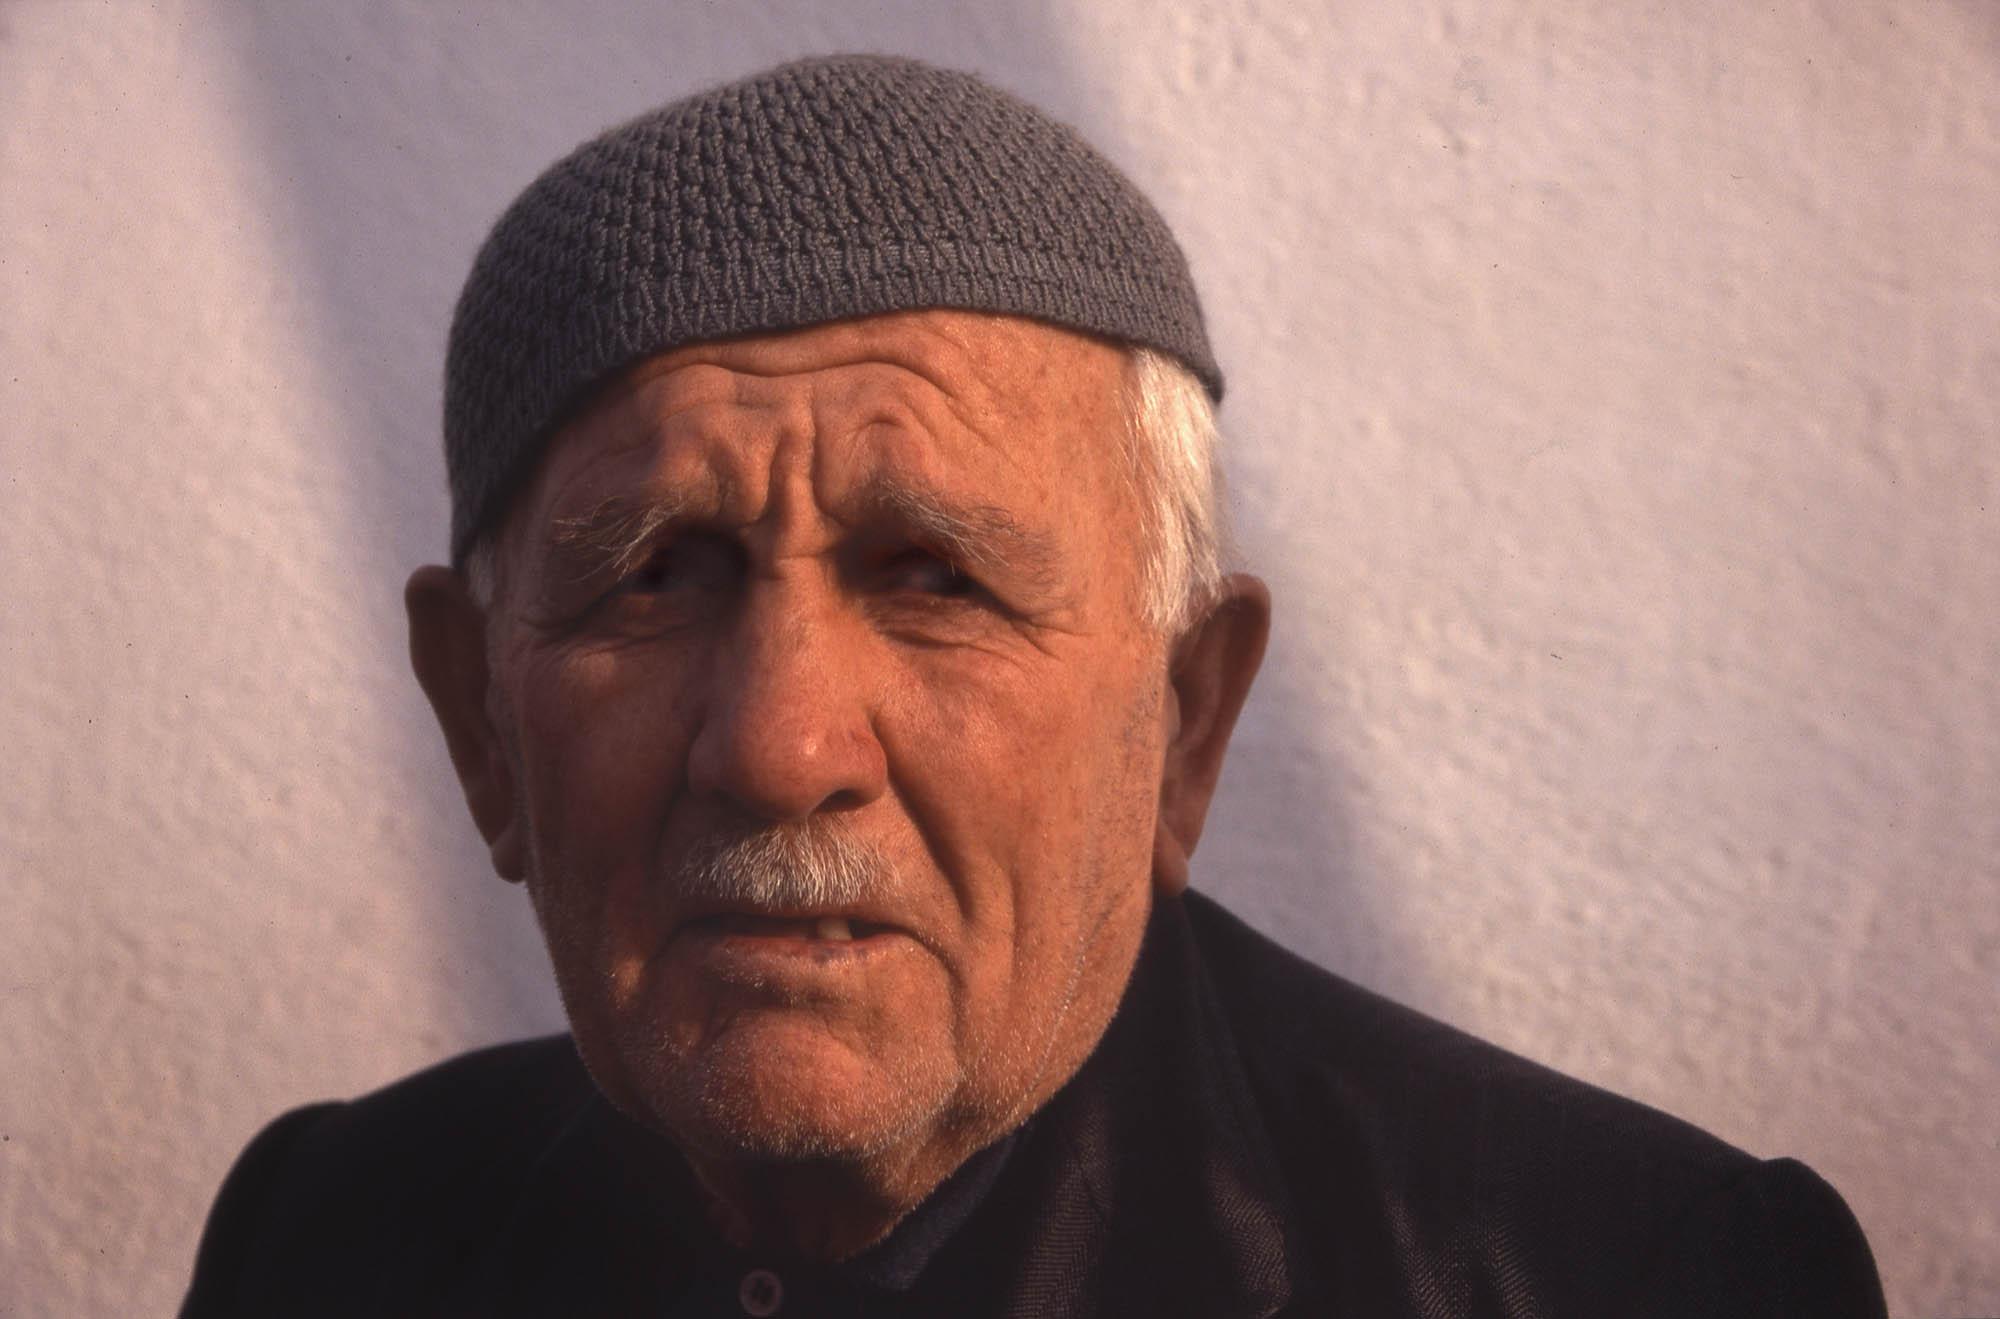 griechenland-muslim-small